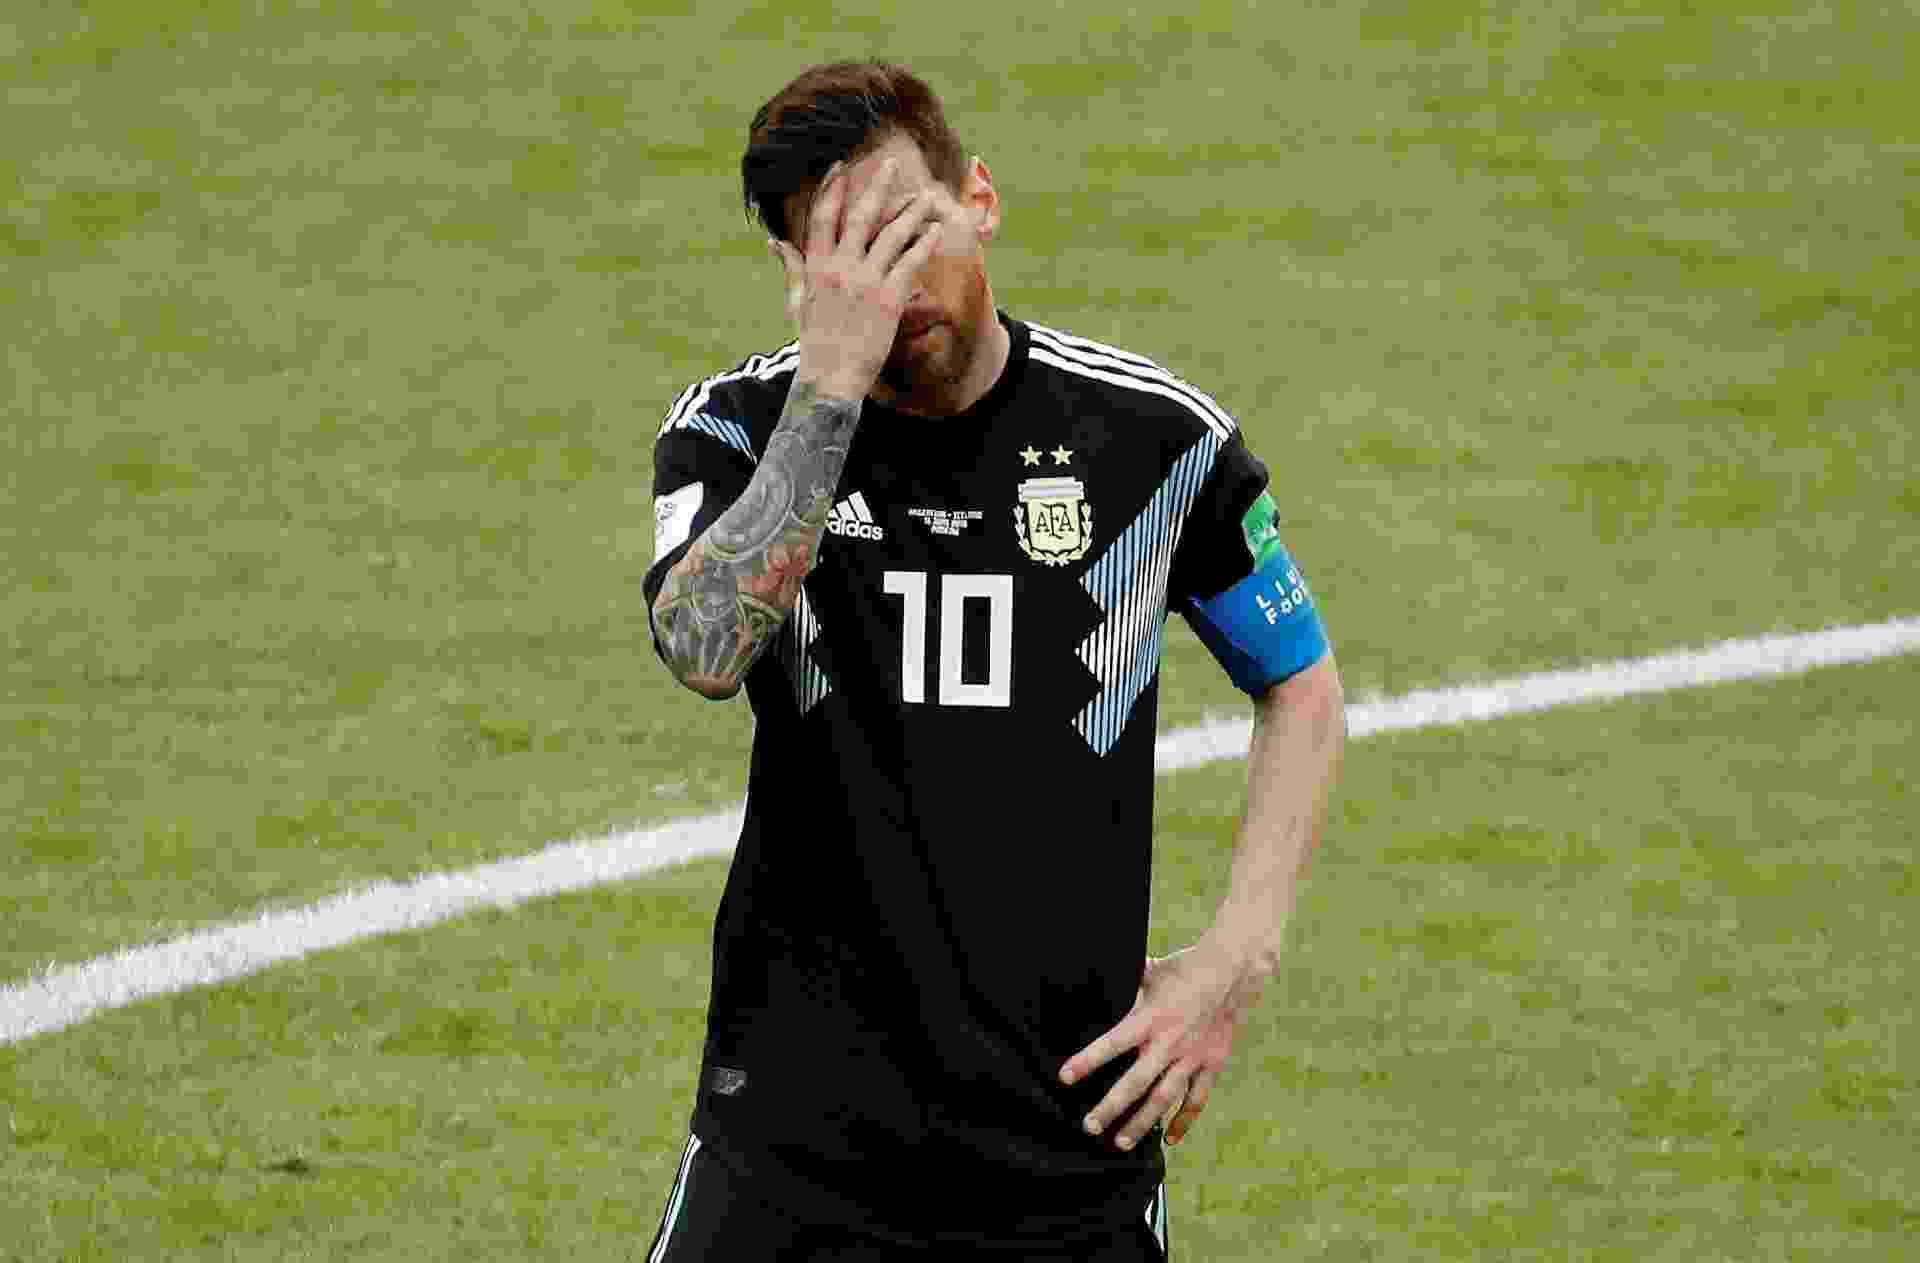 Messi lamenta pênalti perdido na estreia da Argentina contra a Islândia - REUTERS/Christian Hartmann